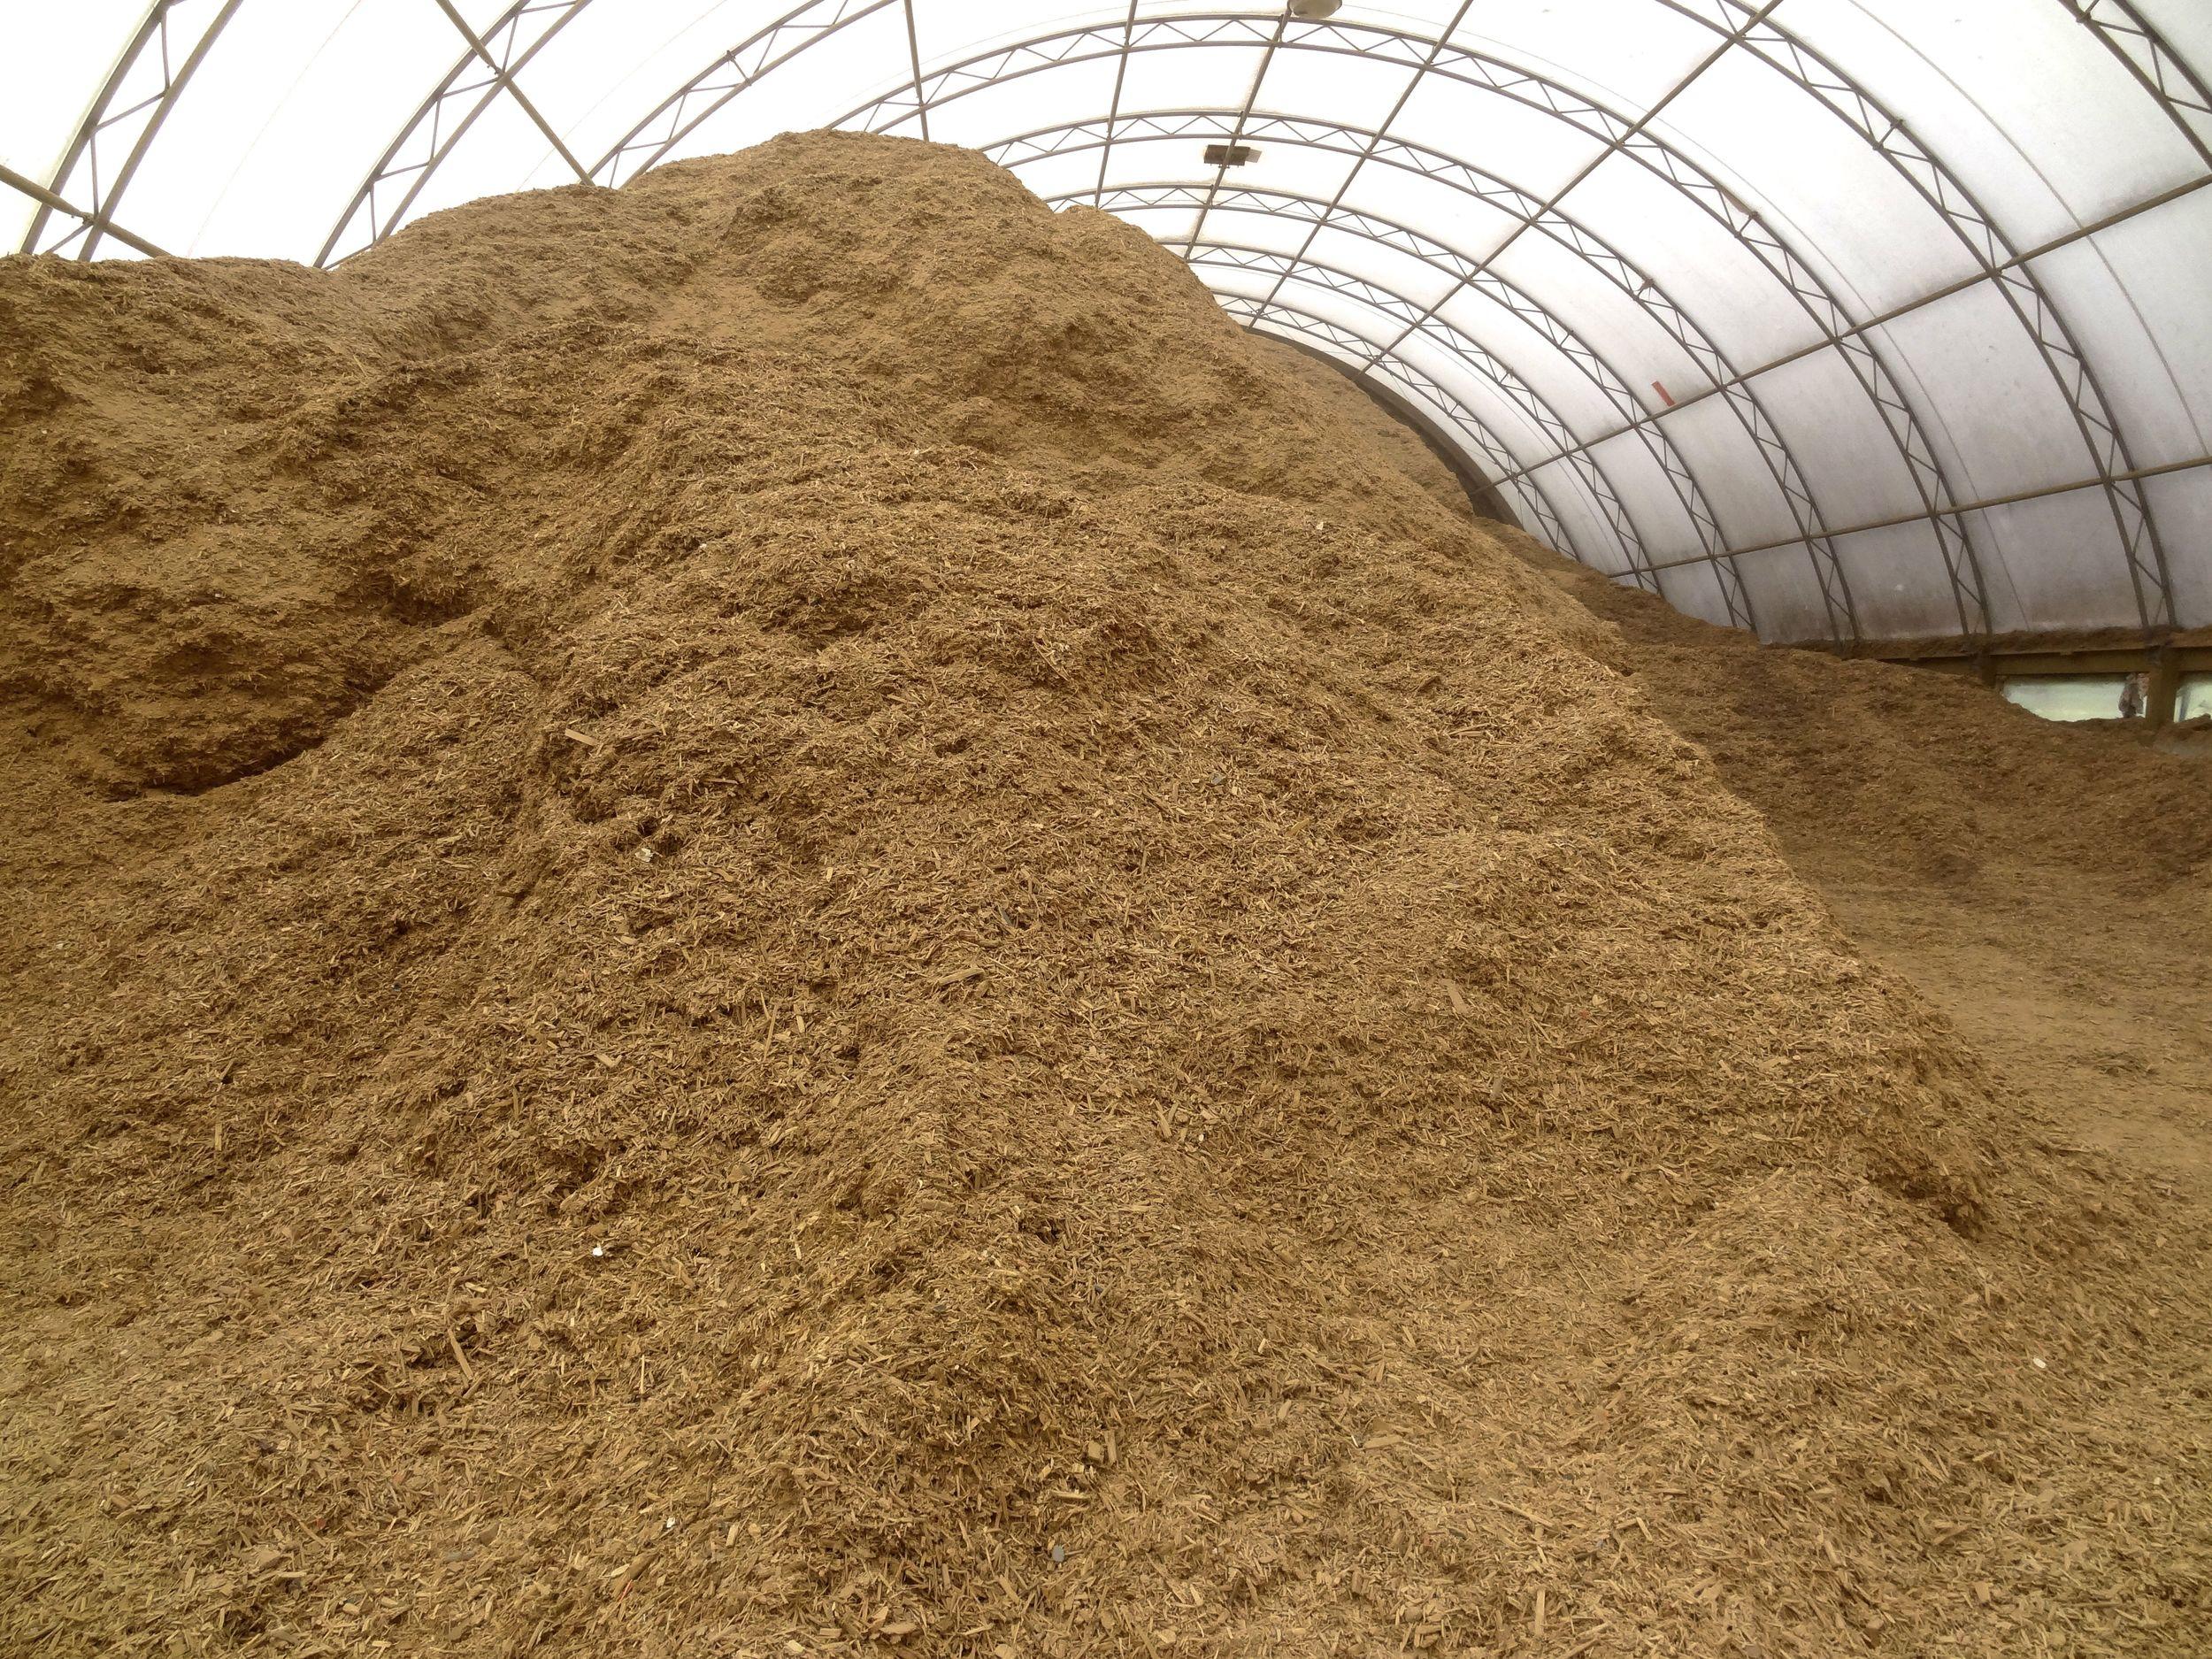 Animal Bedding Biomass